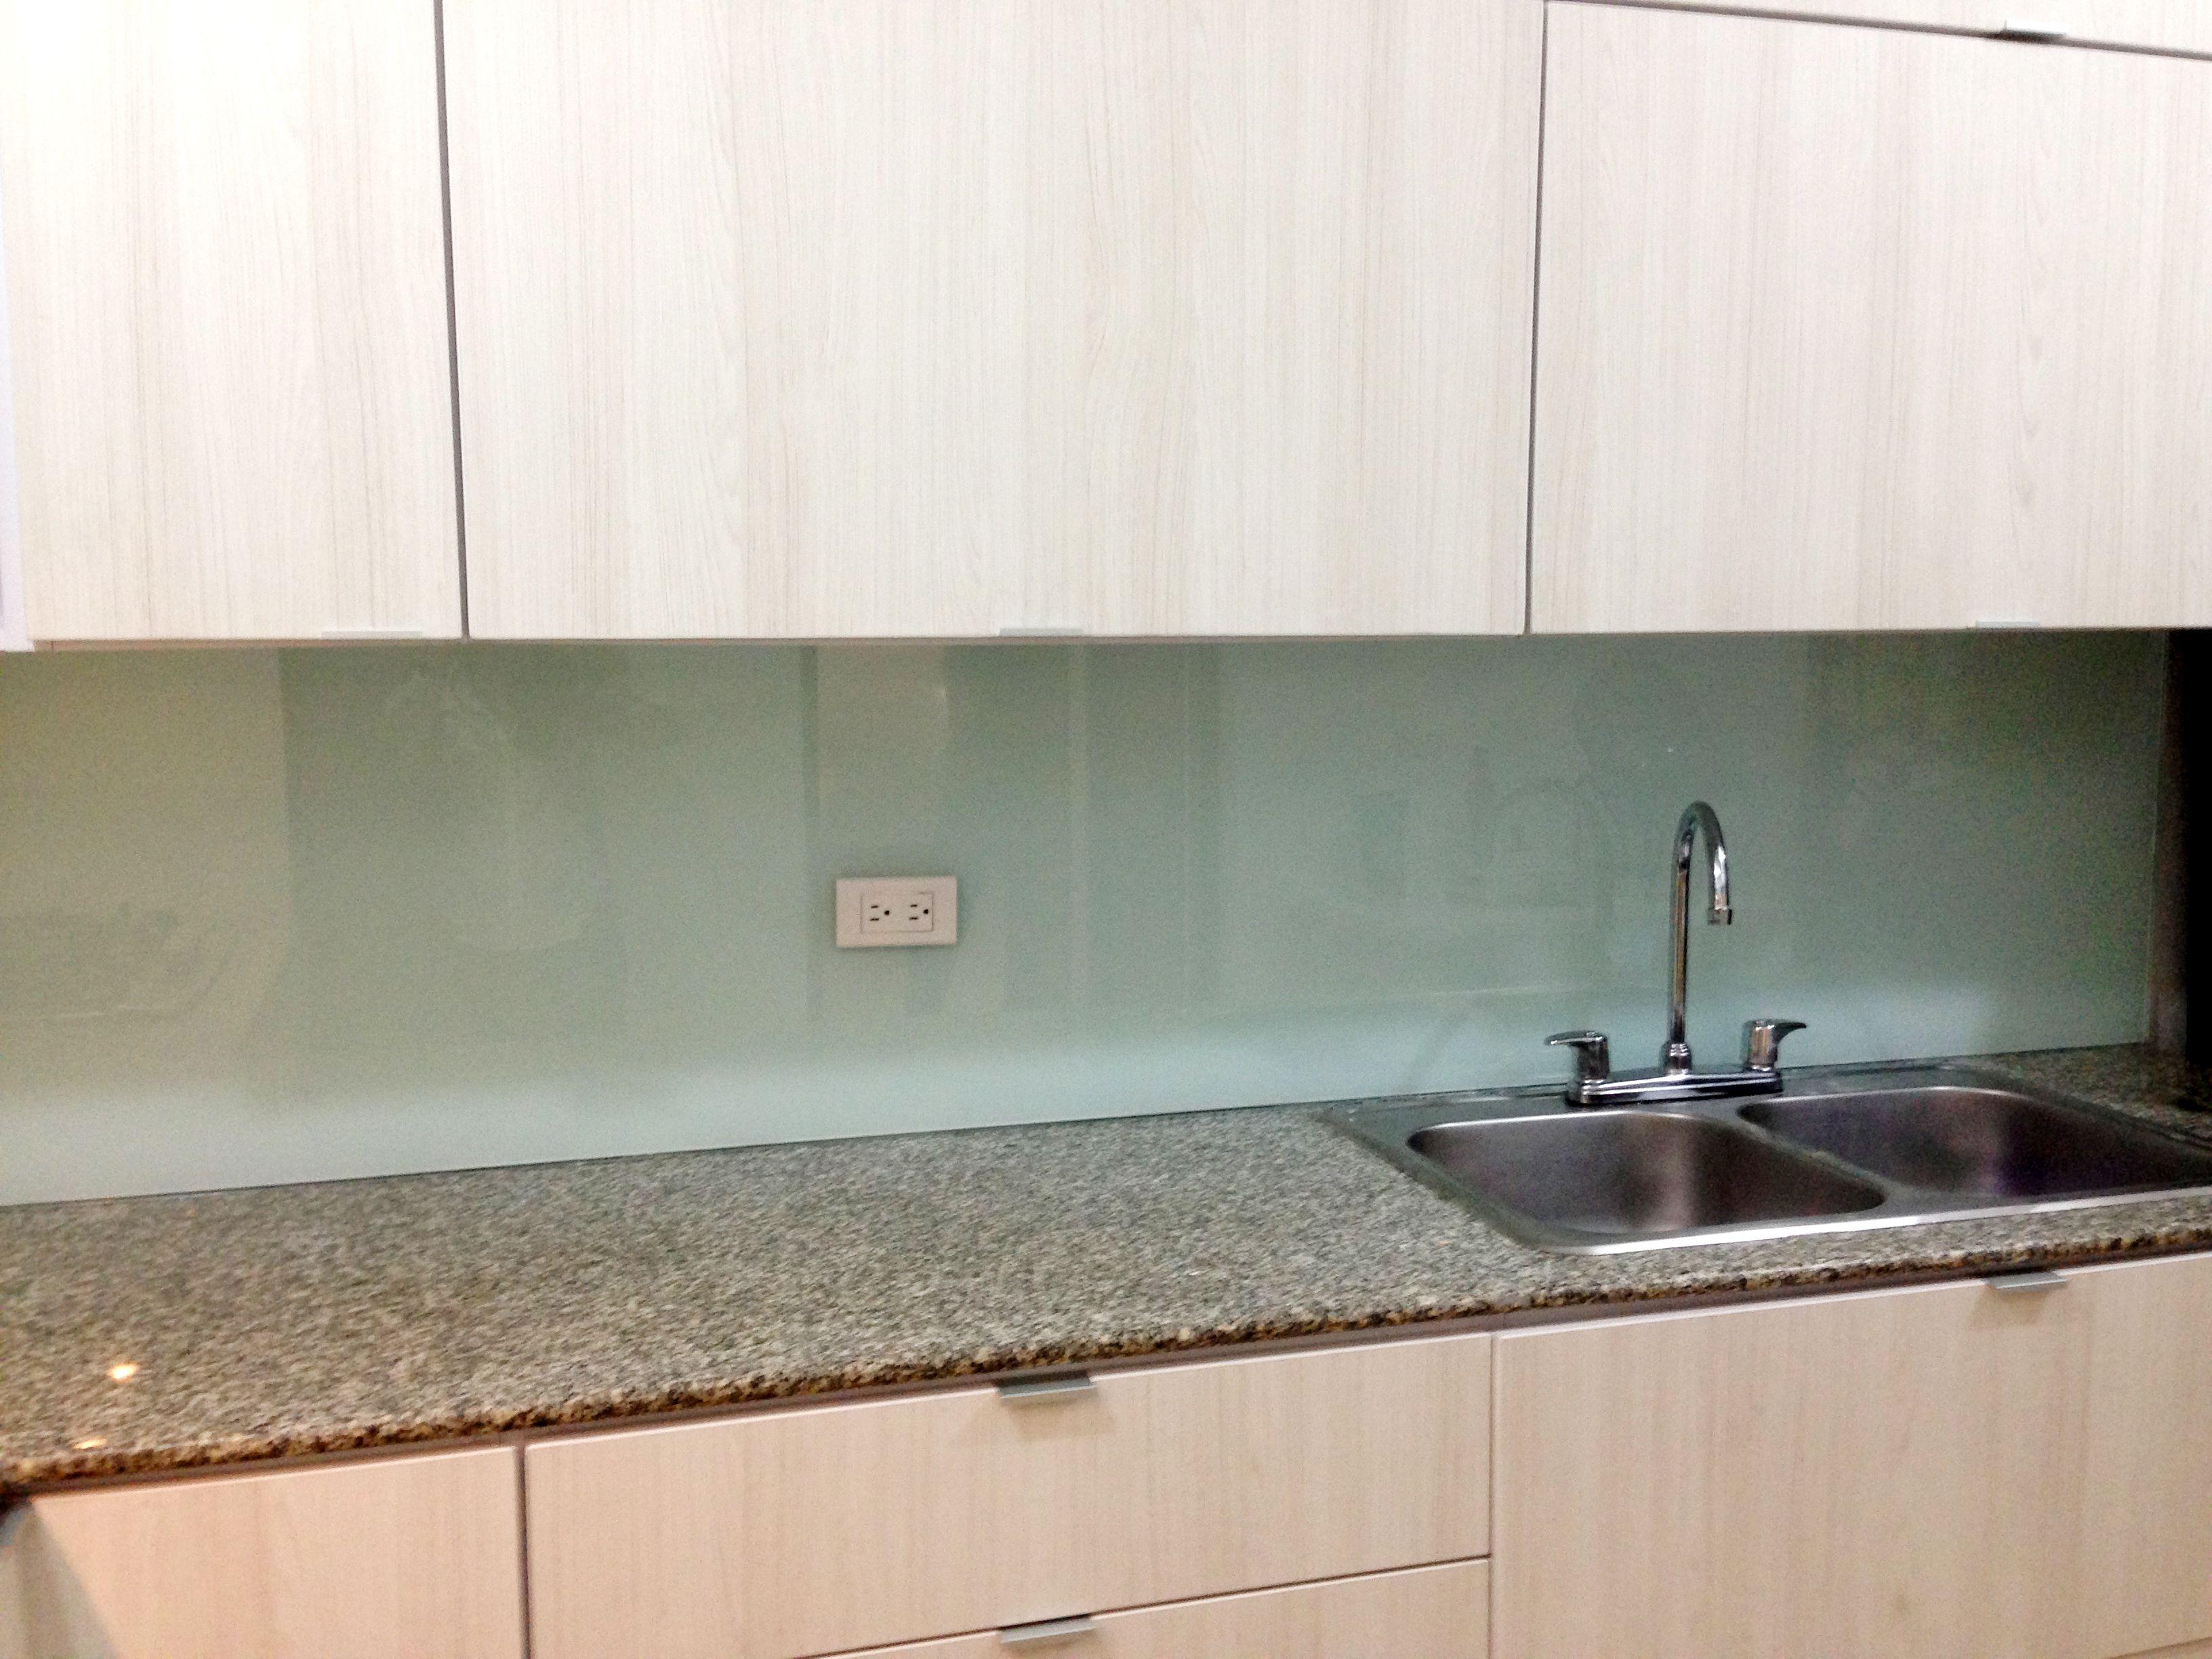 Cocina teka artico salpicadero de vidrio - Cocina encimera teka 4 platos ...